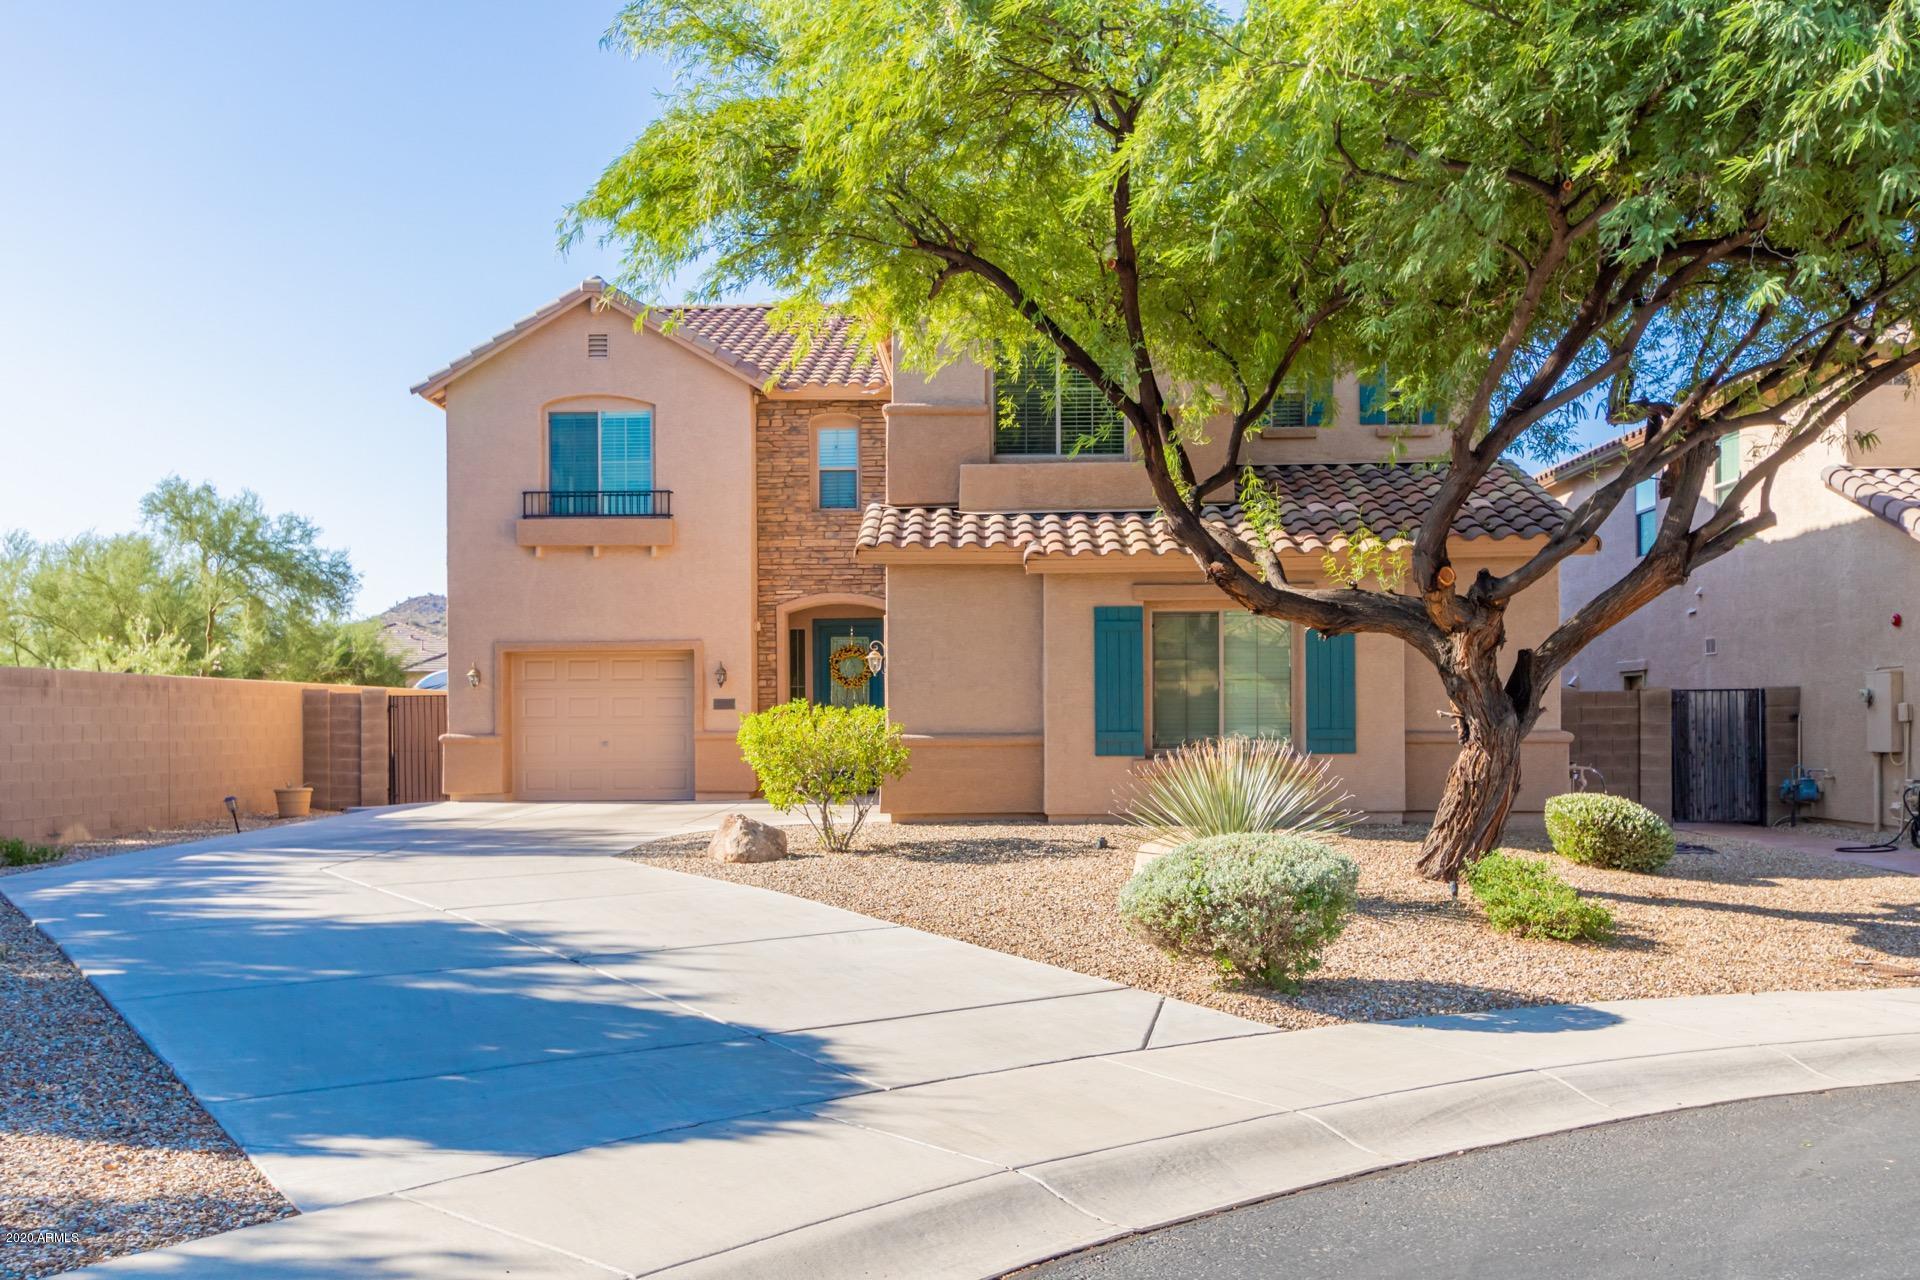 MLS 6128125 7101 W NADINE Way, Peoria, AZ 85383 Peoria AZ Sonoran Mountain Ranch